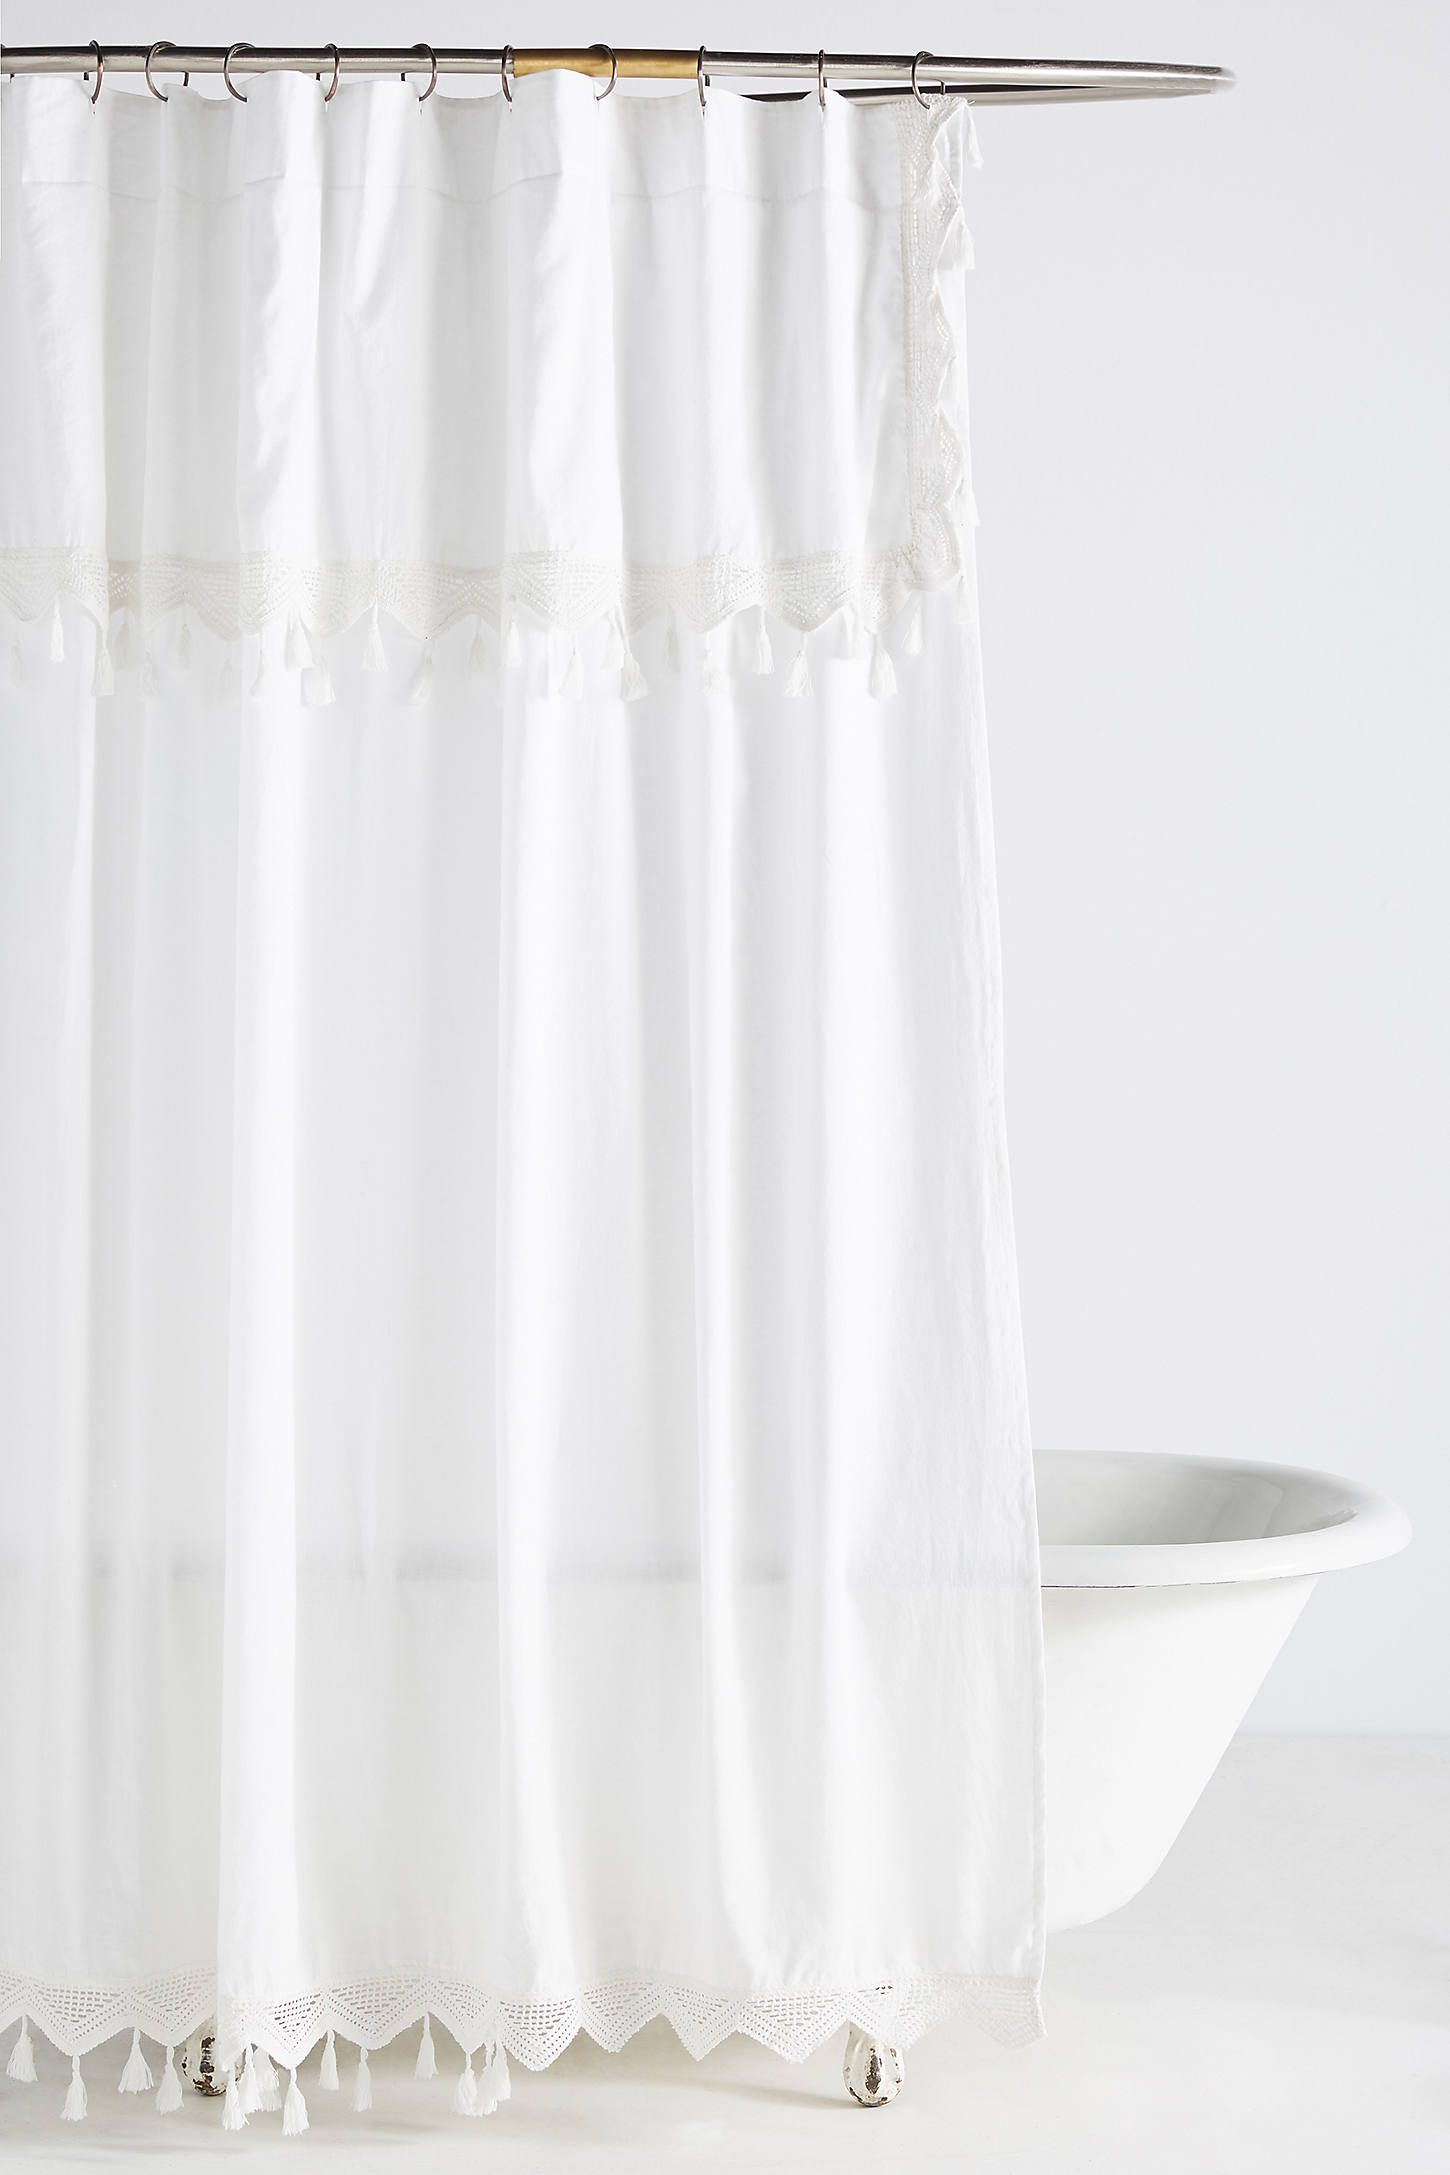 Tasseled Antioch Shower Curtain Curtains White Shower Grey